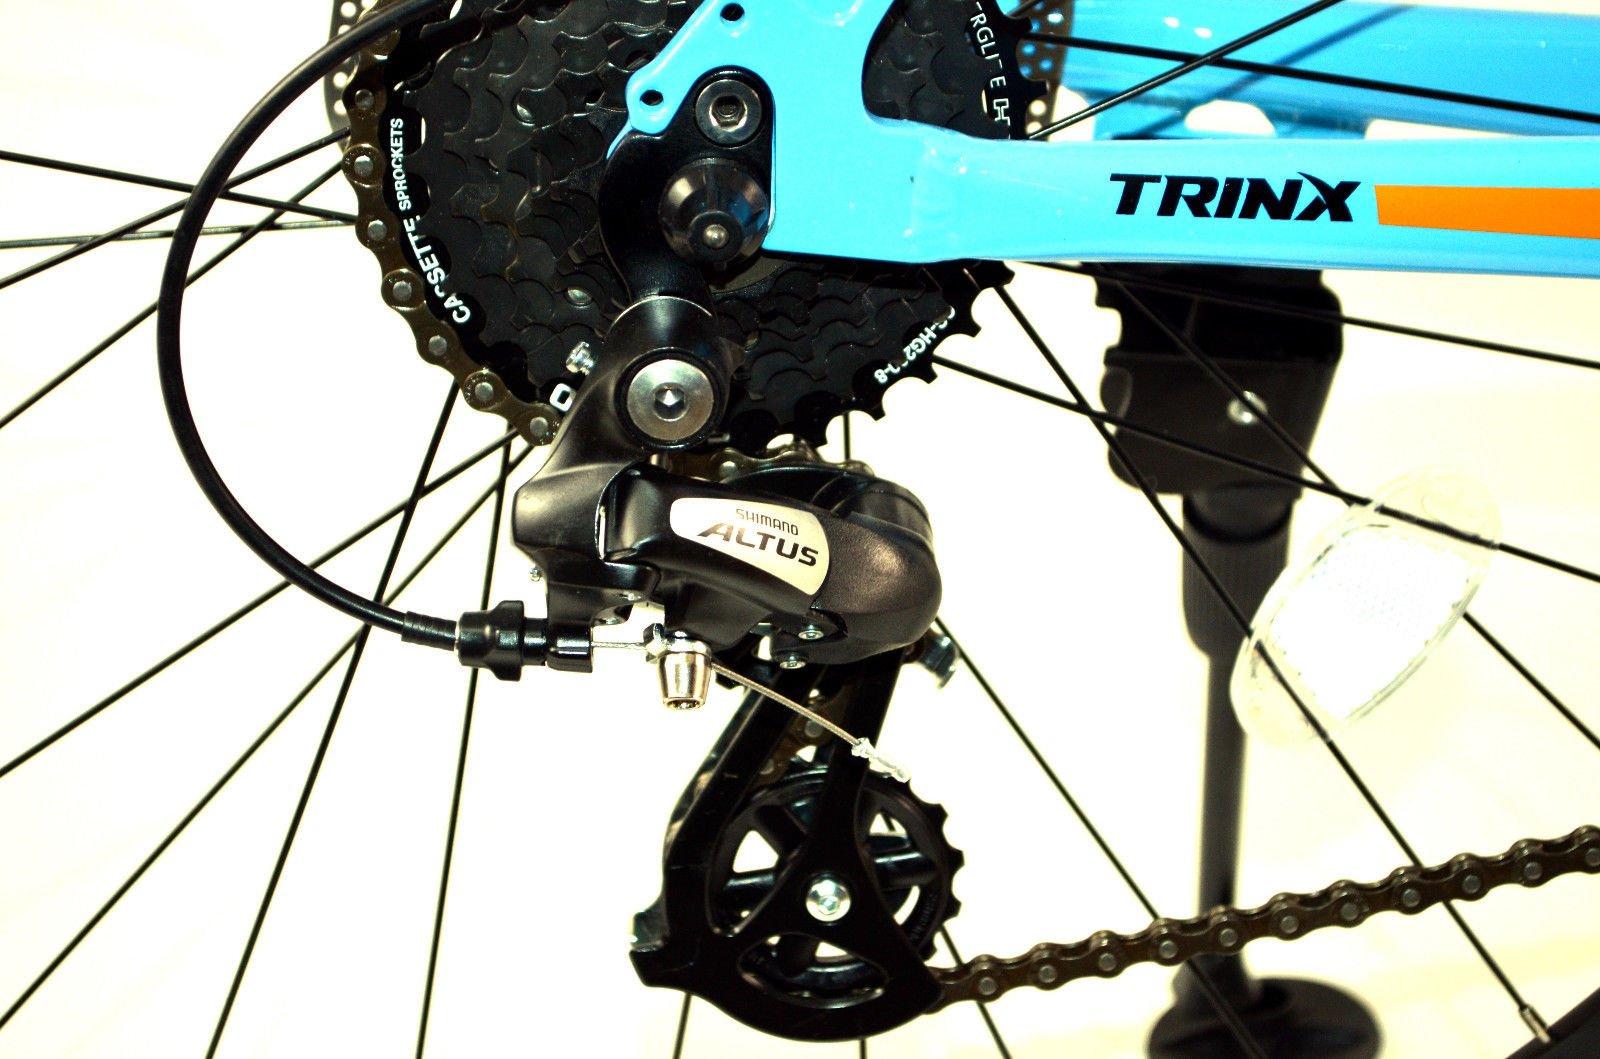 Mountain Bike Bicicleta trinx C 600 Challenger 27,5 MTB 24 velocidades Shimano Altus Bike Bicicleta Mountain Bike Aluminio Hardtail trinx Bikes nuevo: Amazon.es: Deportes y aire libre